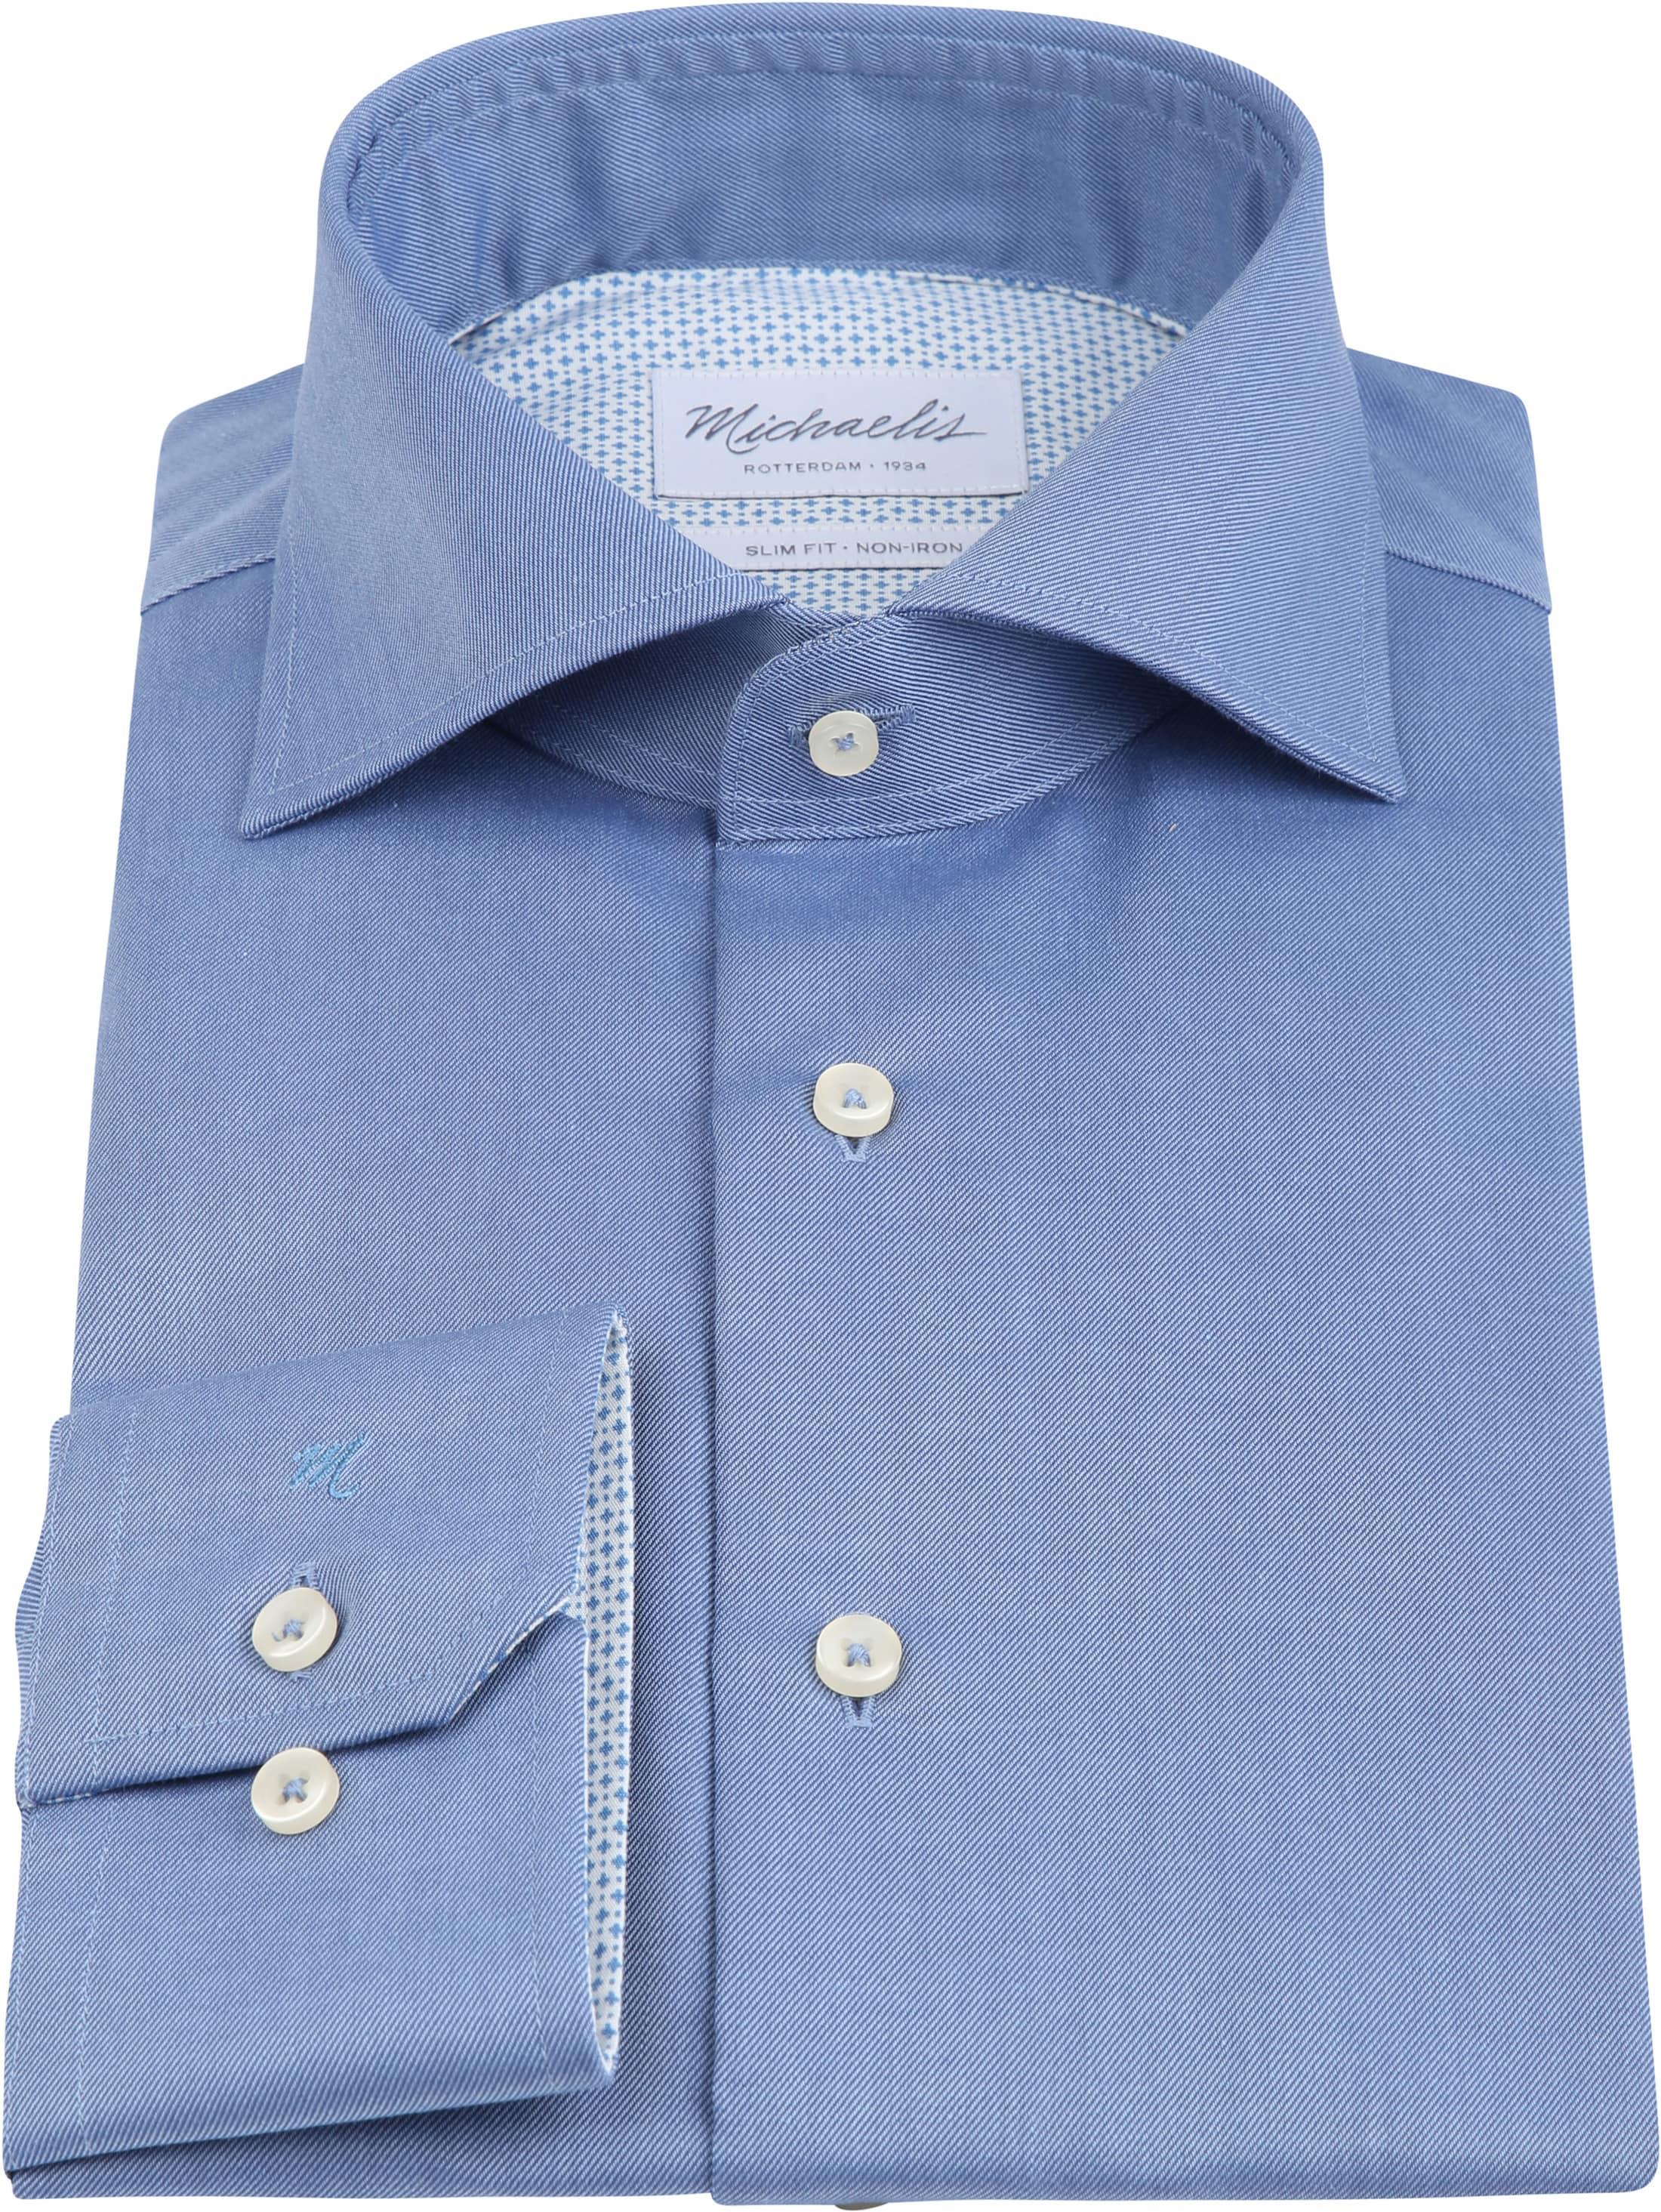 Michaelis Overhemd Strijkvrij Uni Blauw foto 2